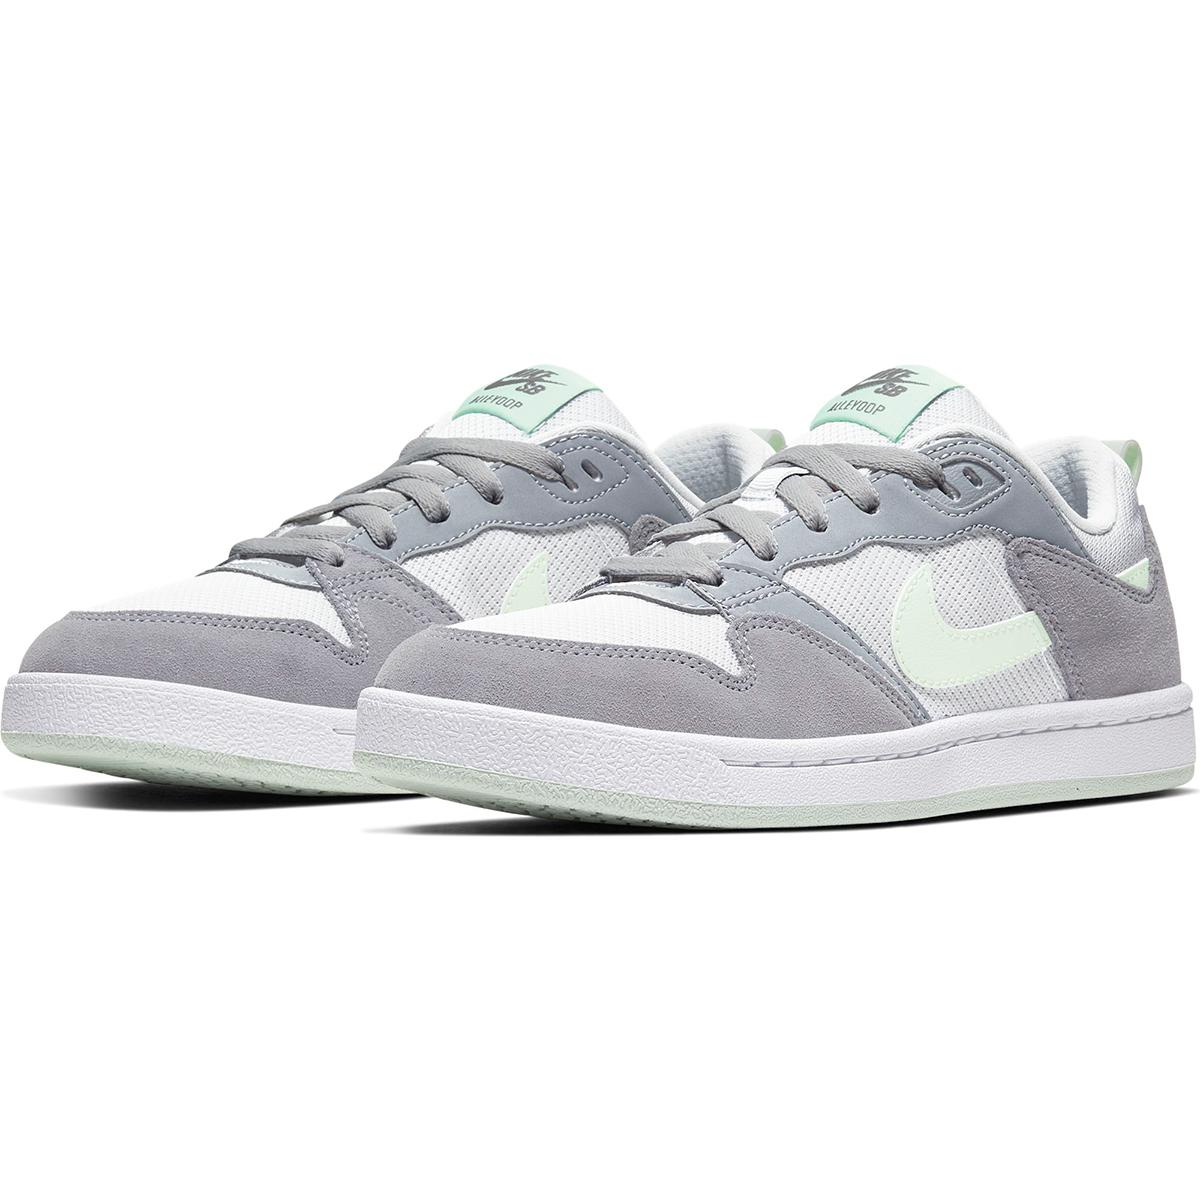 NIKE SB Women's Alleyoop Sneaker